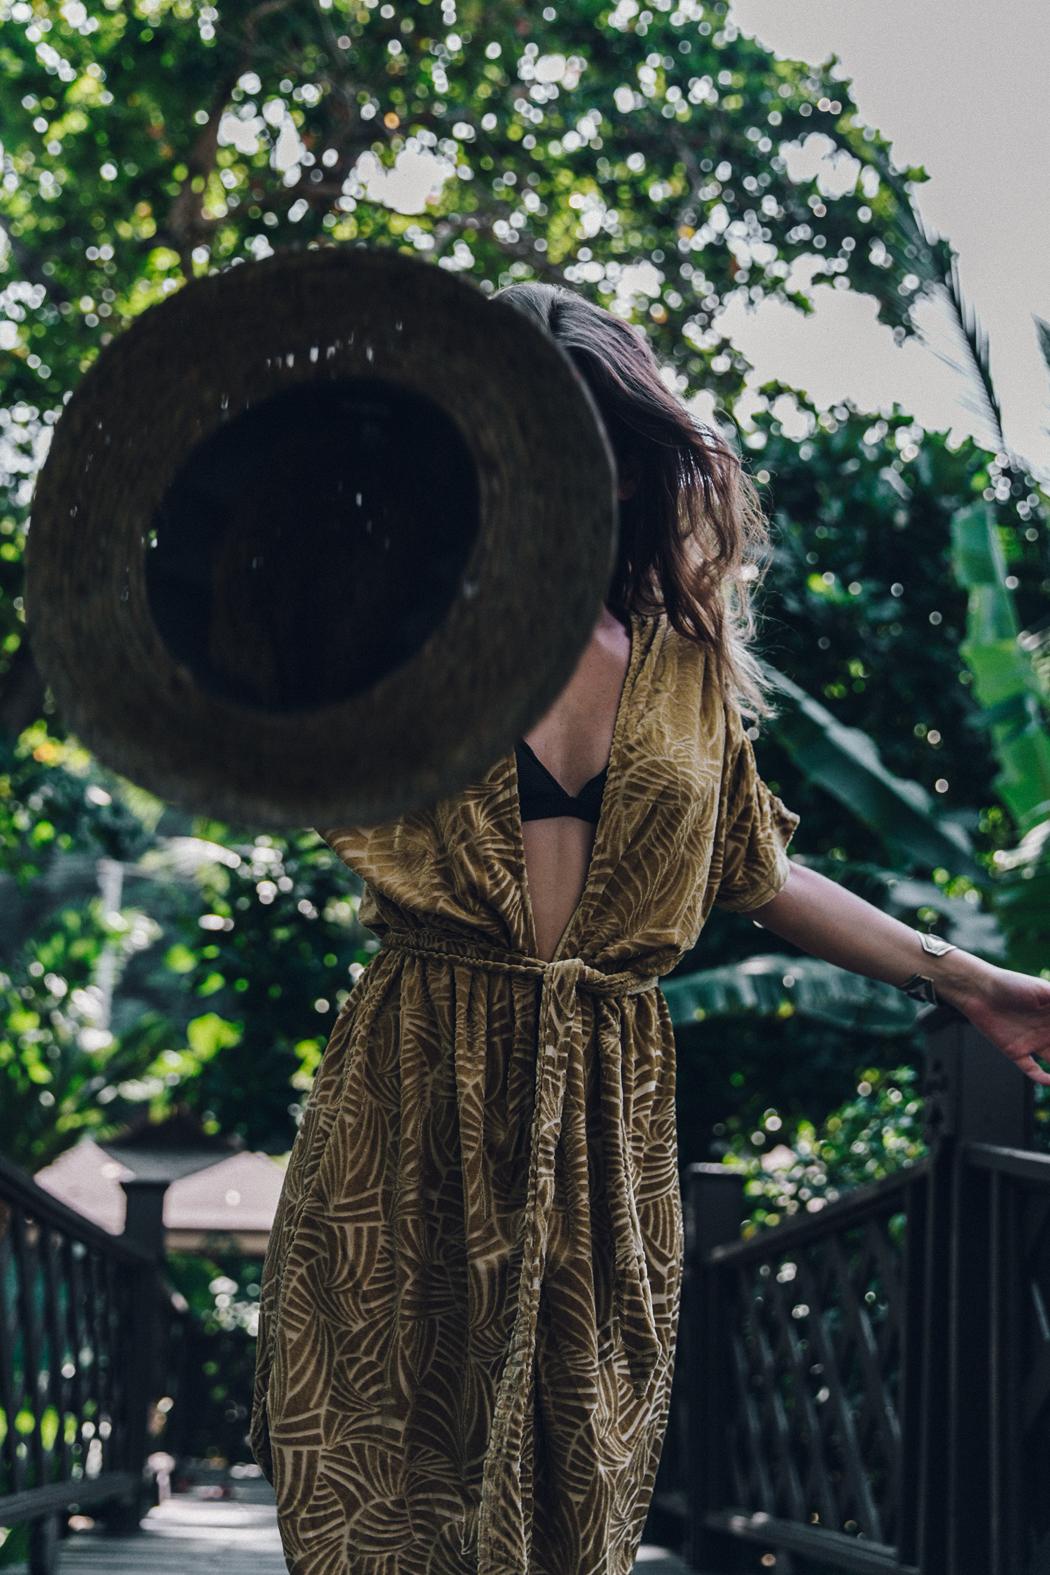 Velvet_Kimono-Thailand-Summer-Peony_Swimwear-Beach_Look-Collage_Vintage-17